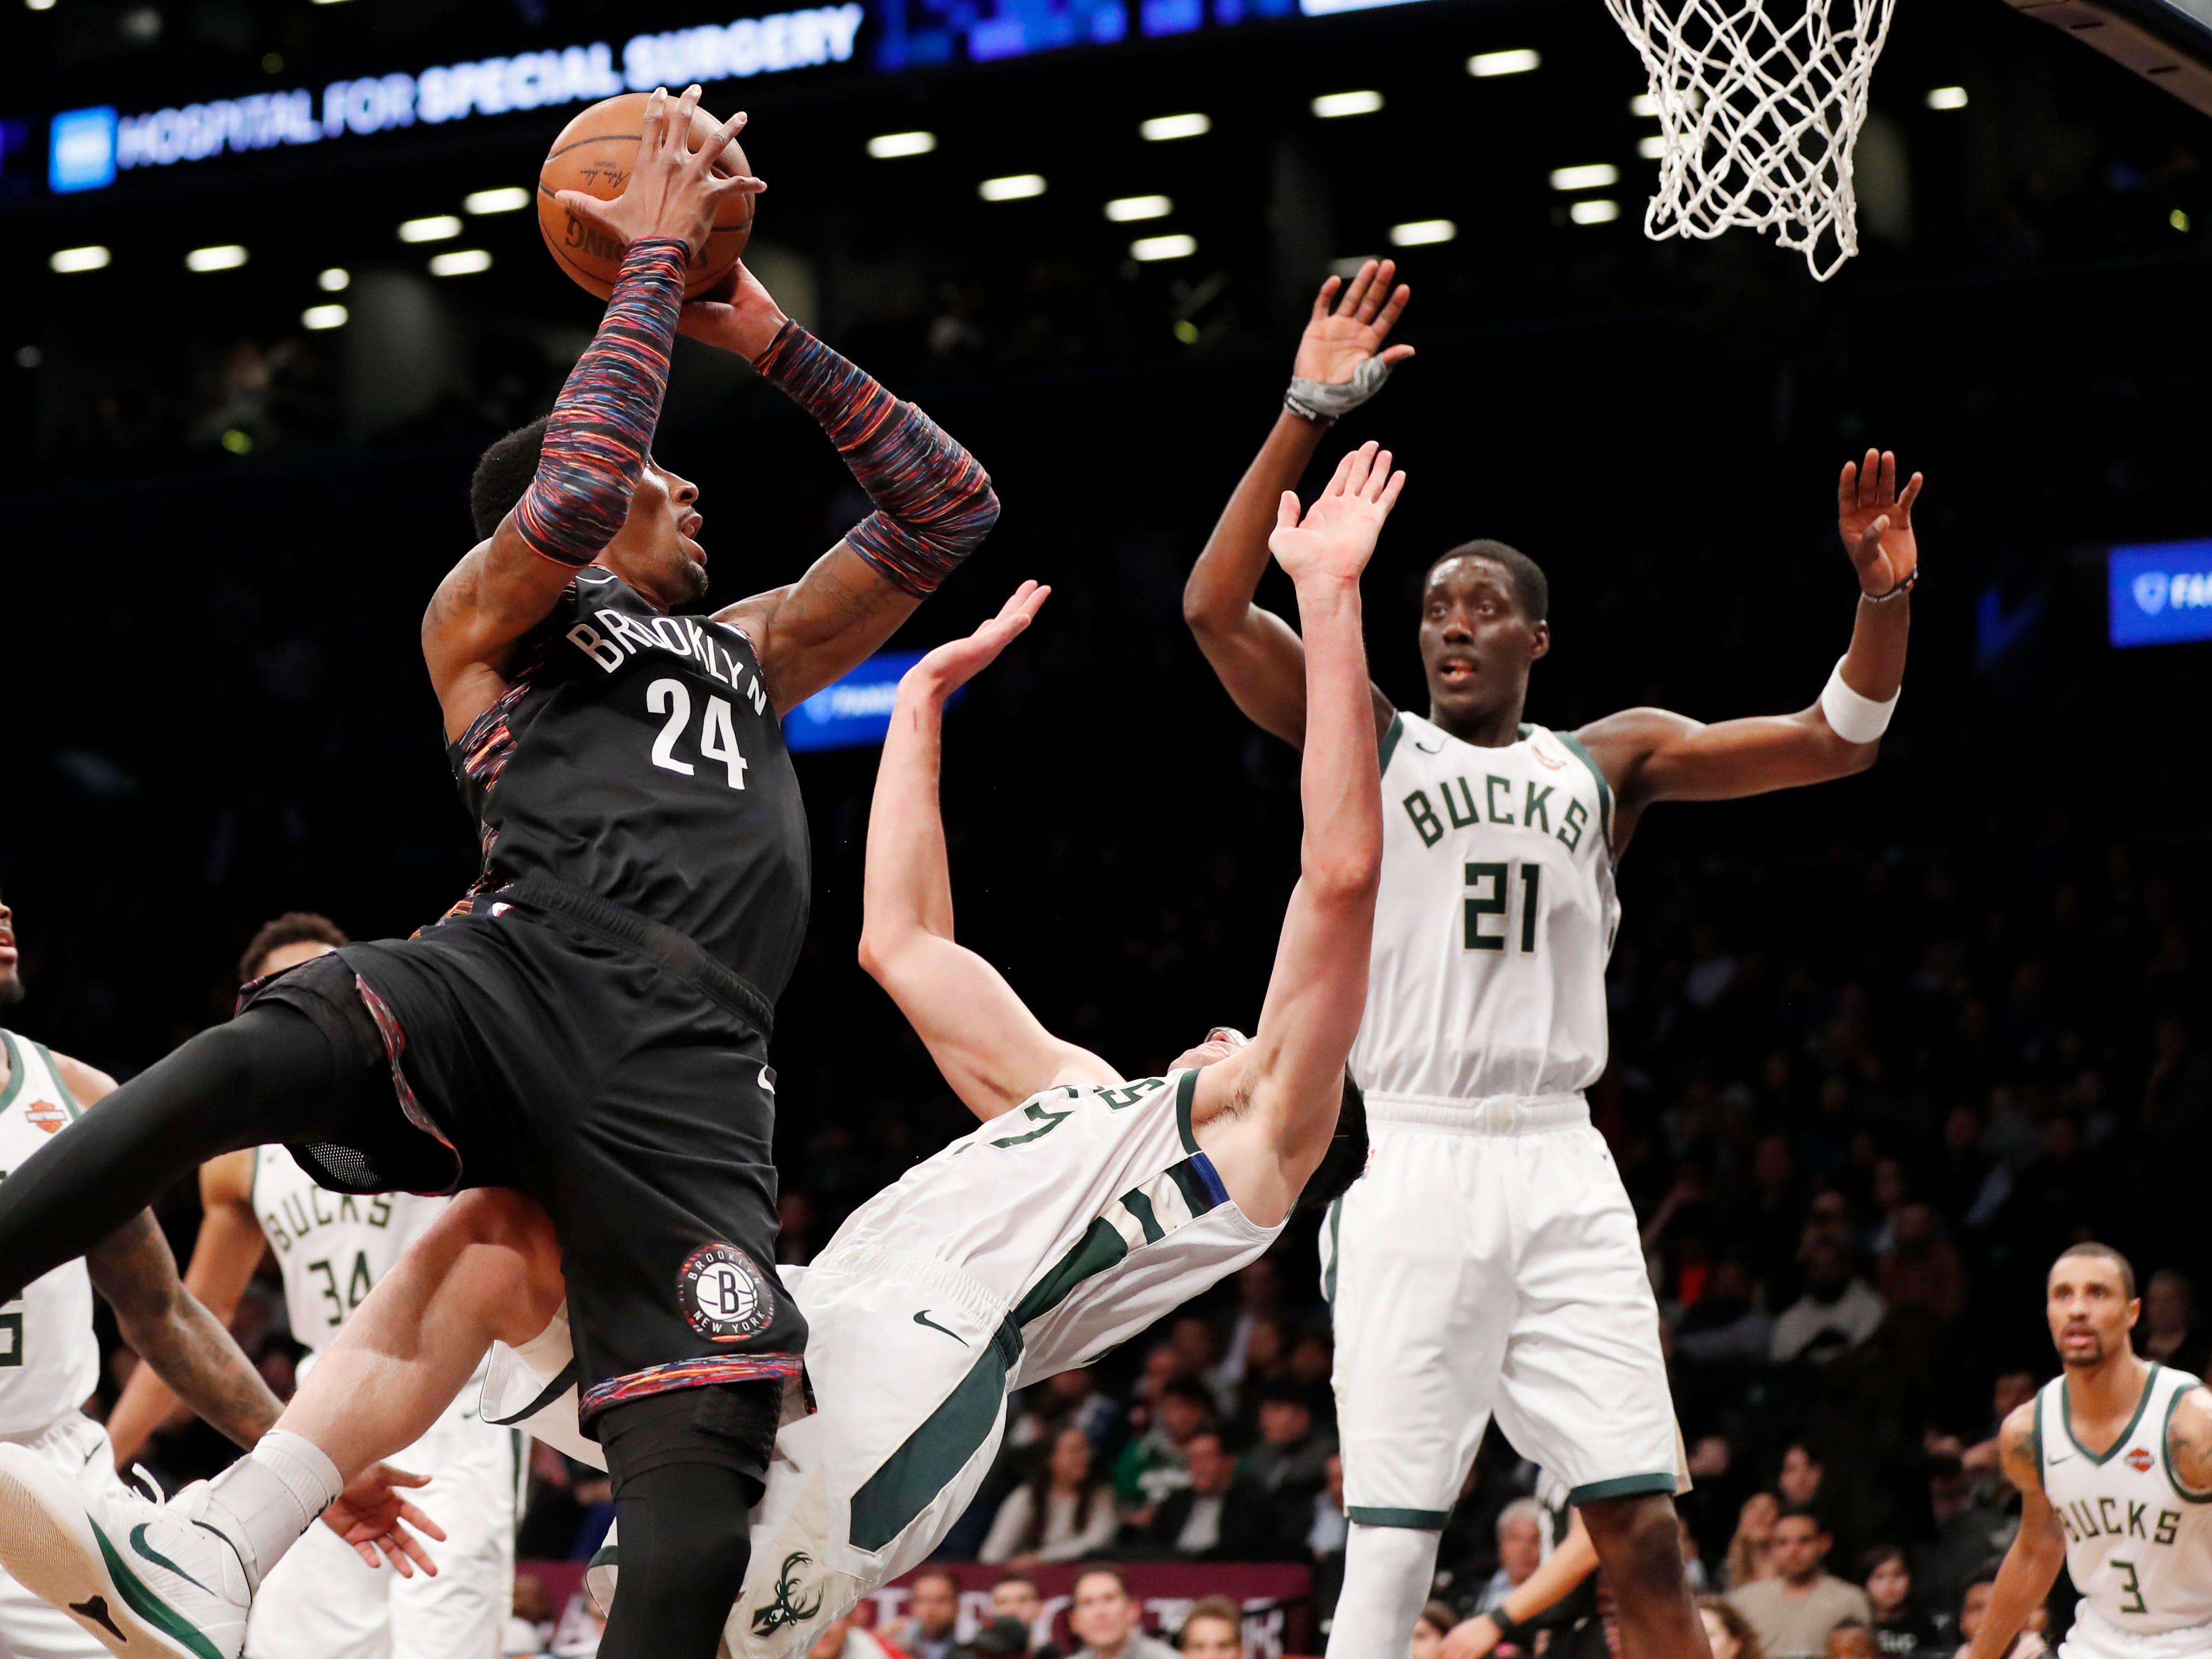 Bucks forward Ersan Ilyasova draws a charging foul on the Nets' Rondae Hollis-Jefferson during the first half Monday night.